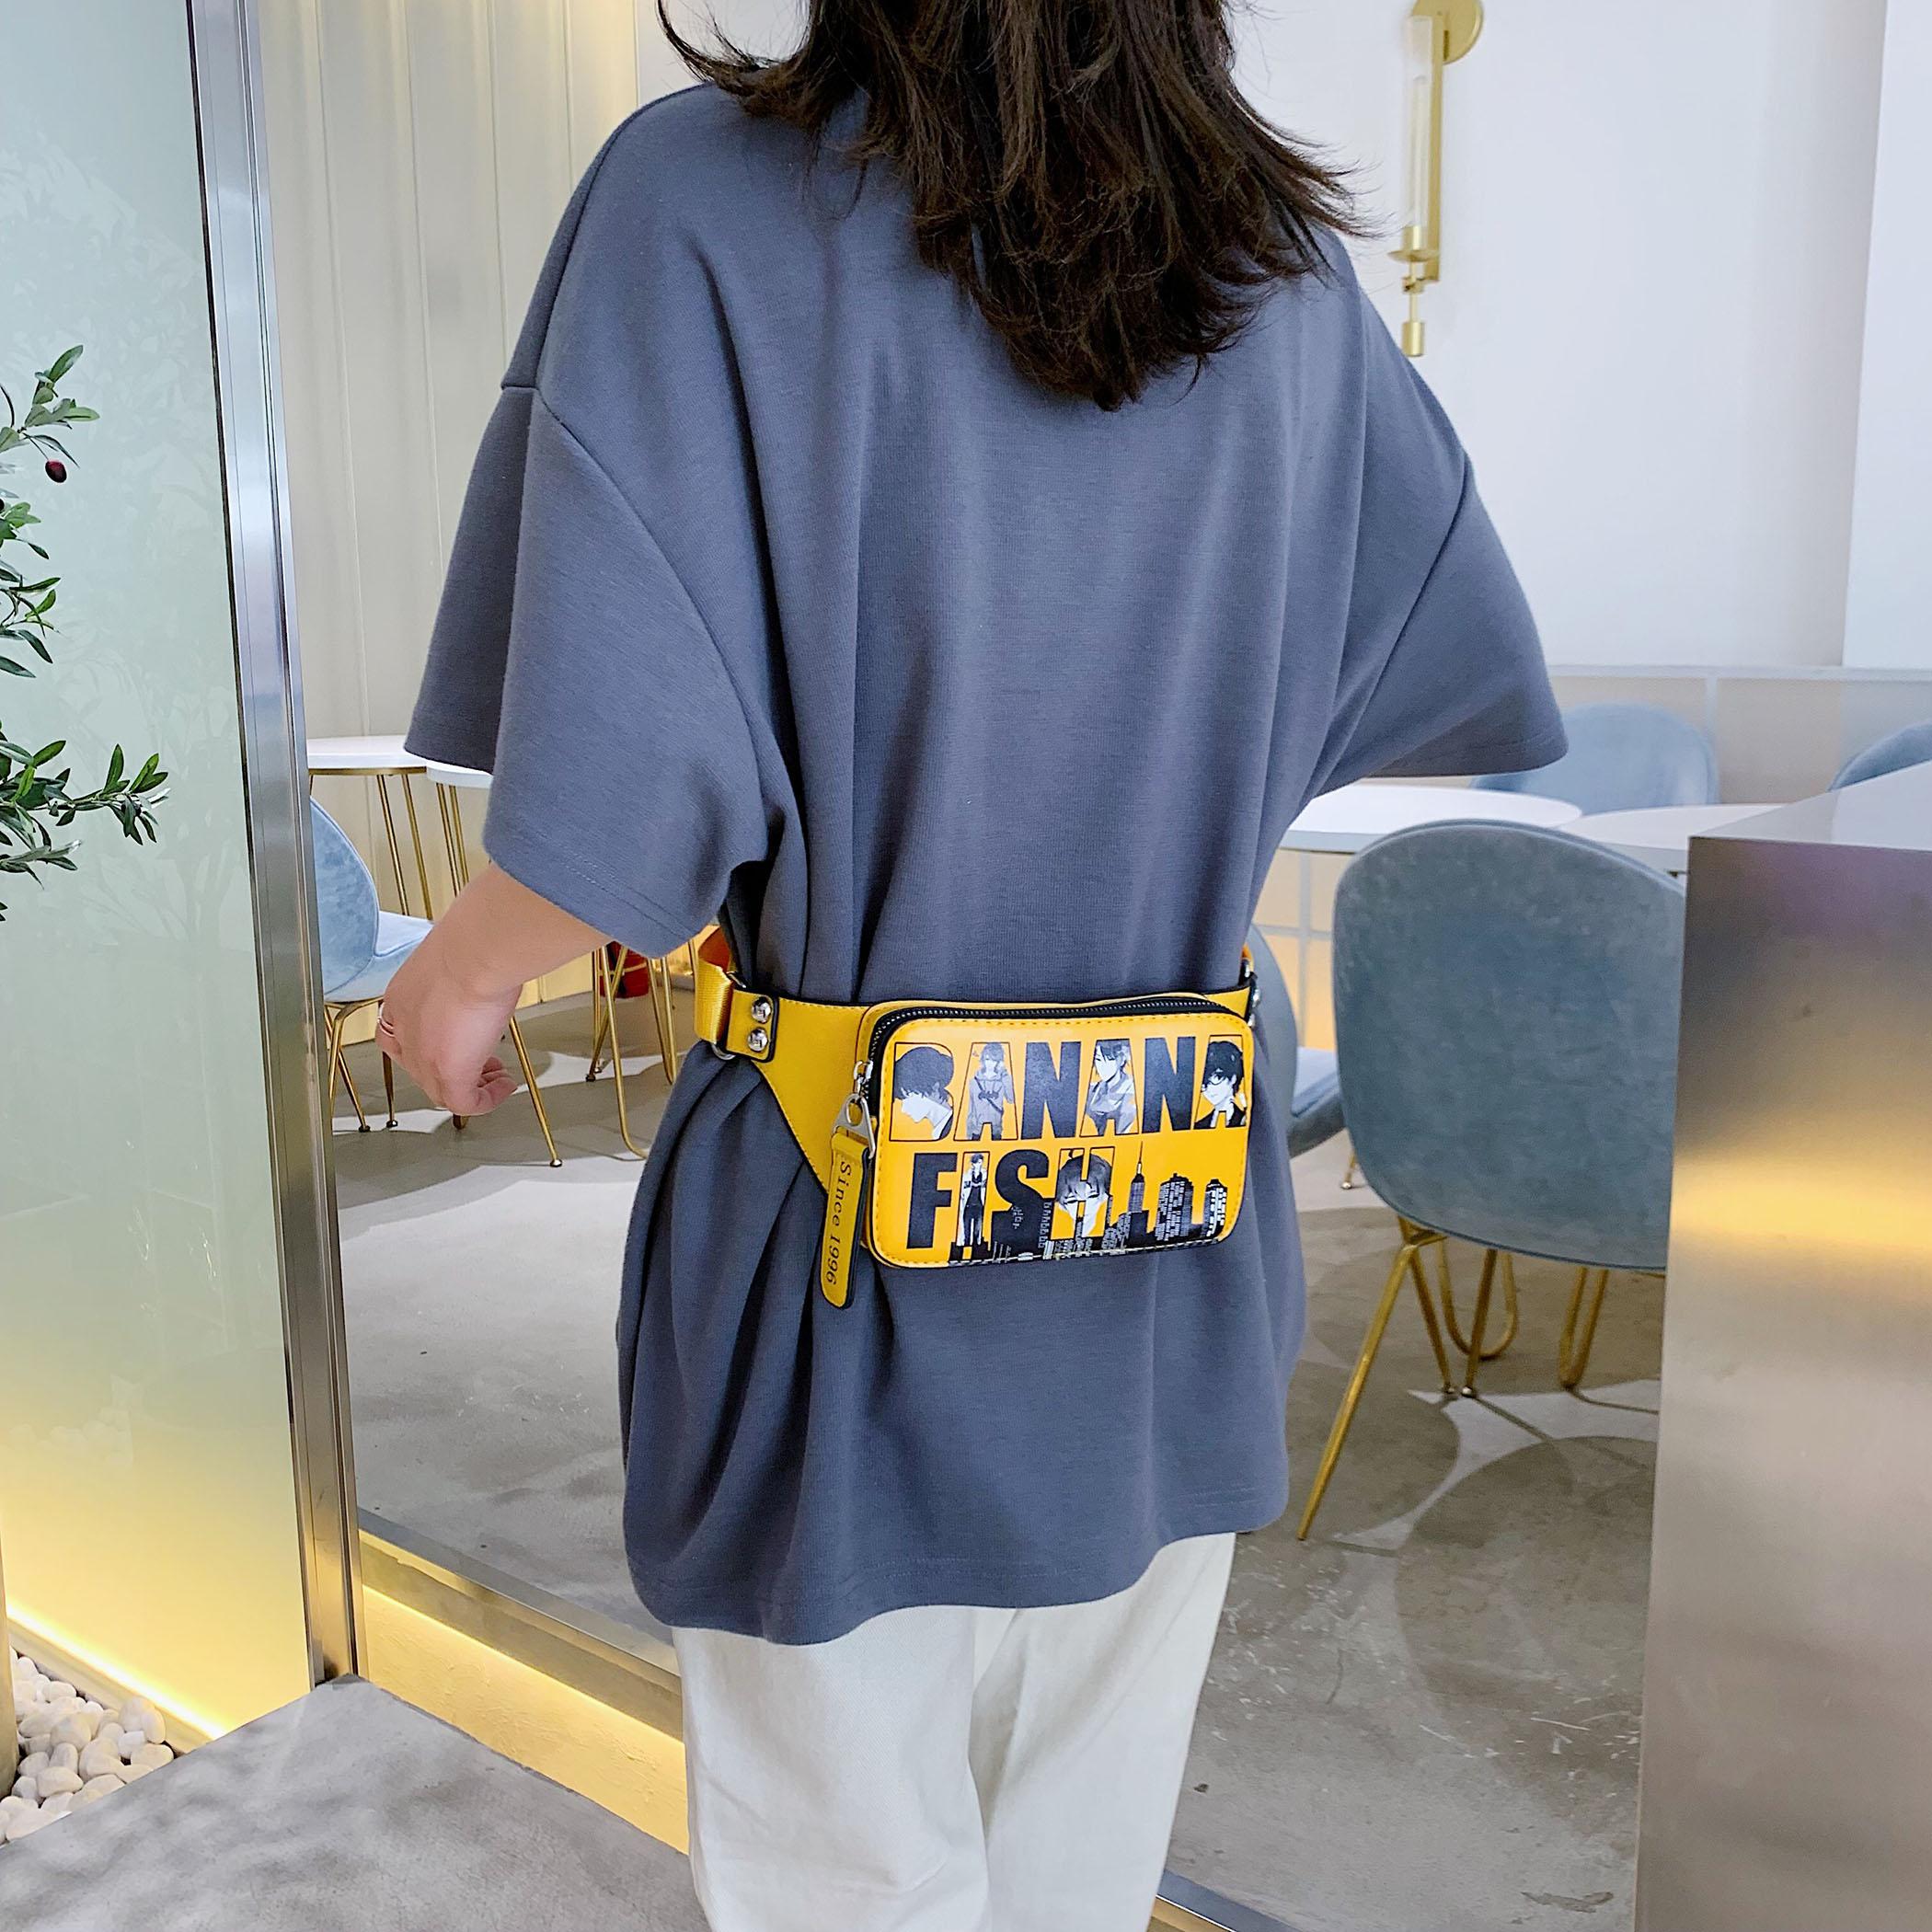 Graffiti Fanny Packs For Women 2019 New Designer Chest Bags Ladies Fashion Phone Purses Belt Bag Female Leather Waist Pack